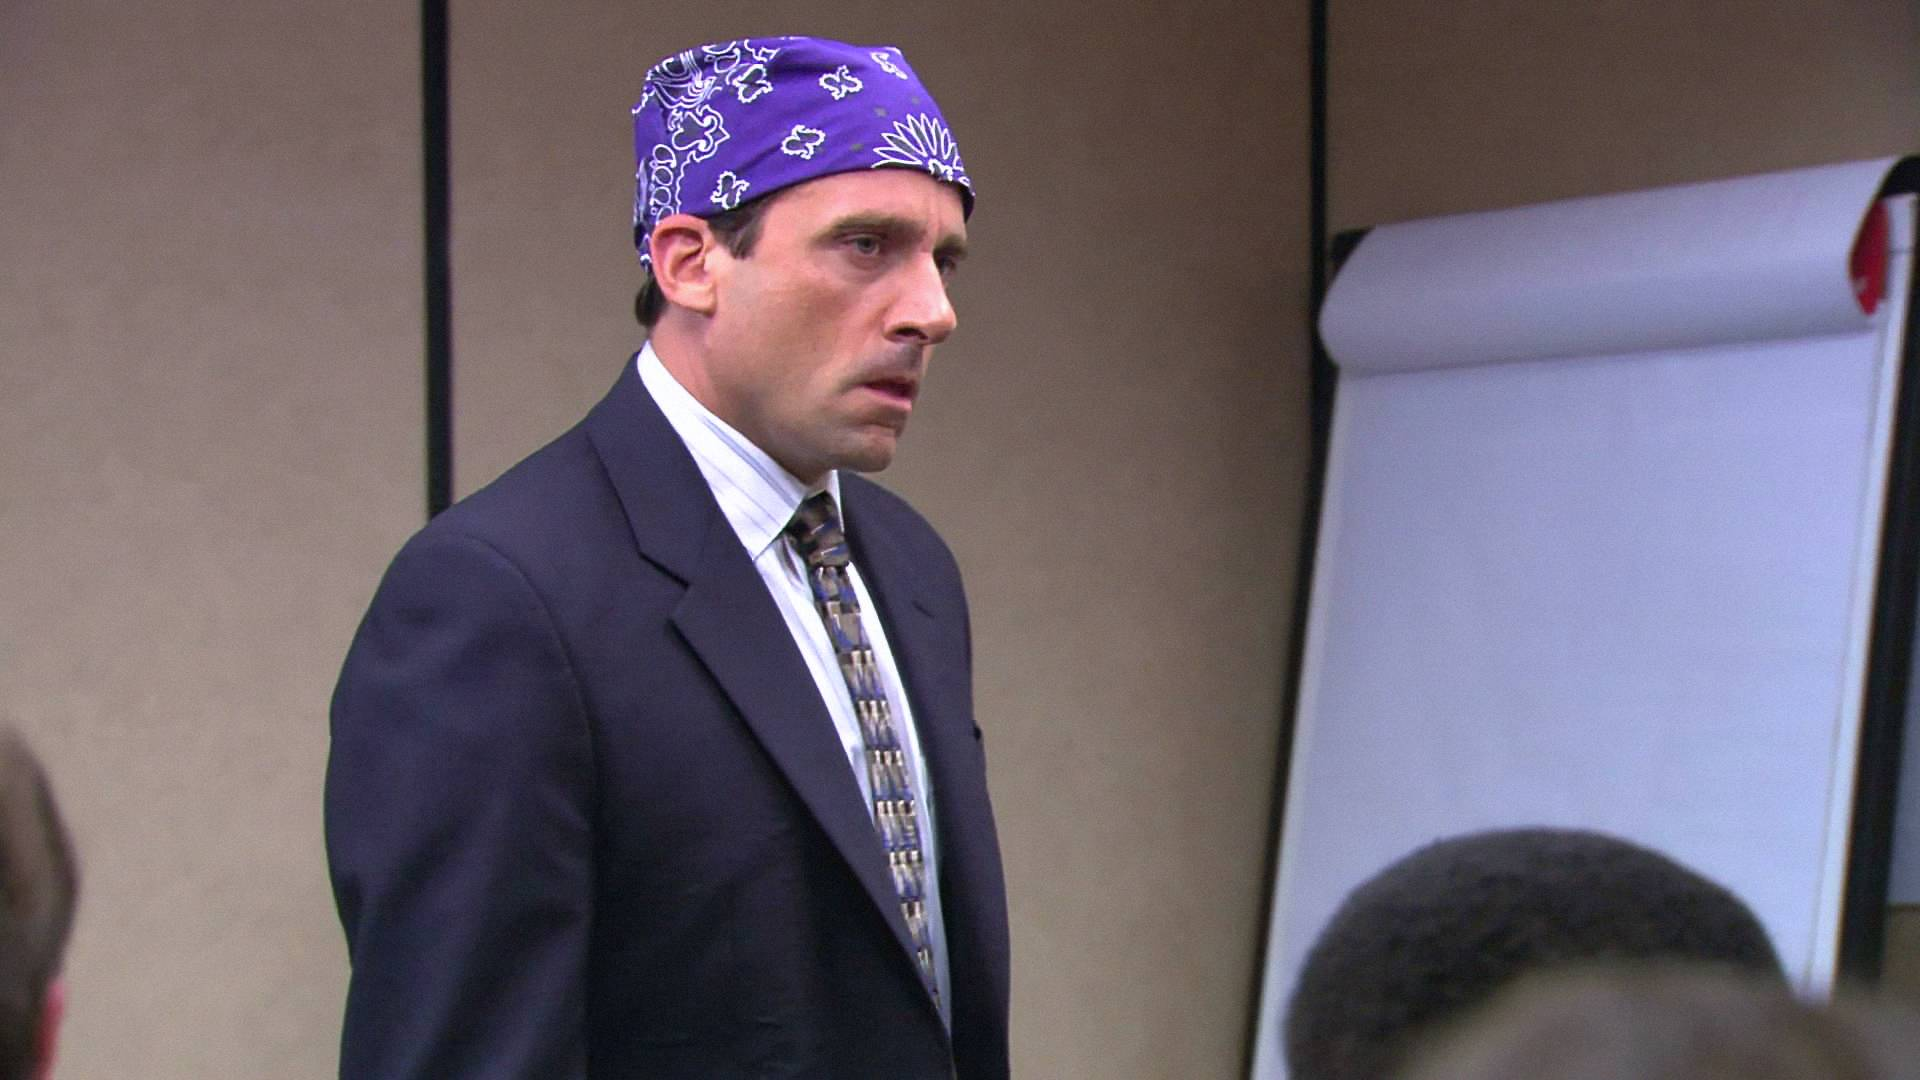 The Office Season 3 Episode 9